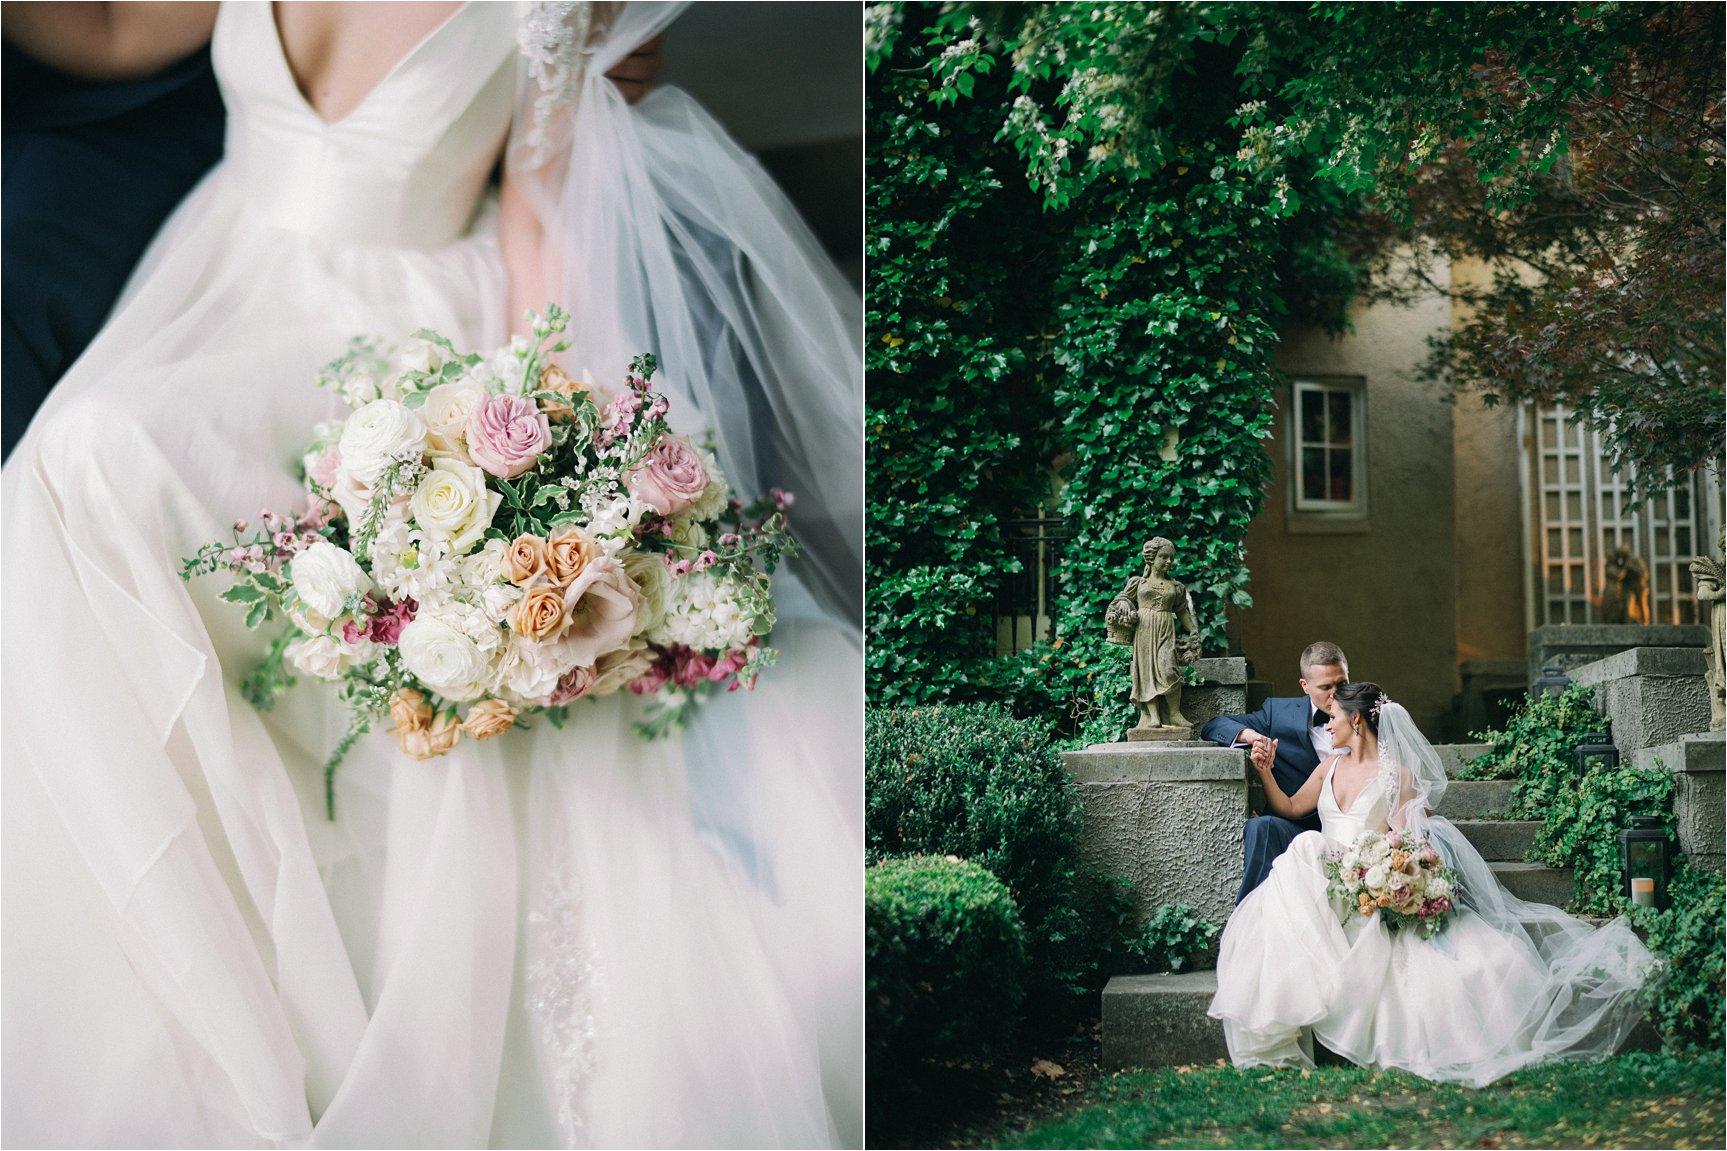 Lord_Thompson_Manor_Wedding102.JPG